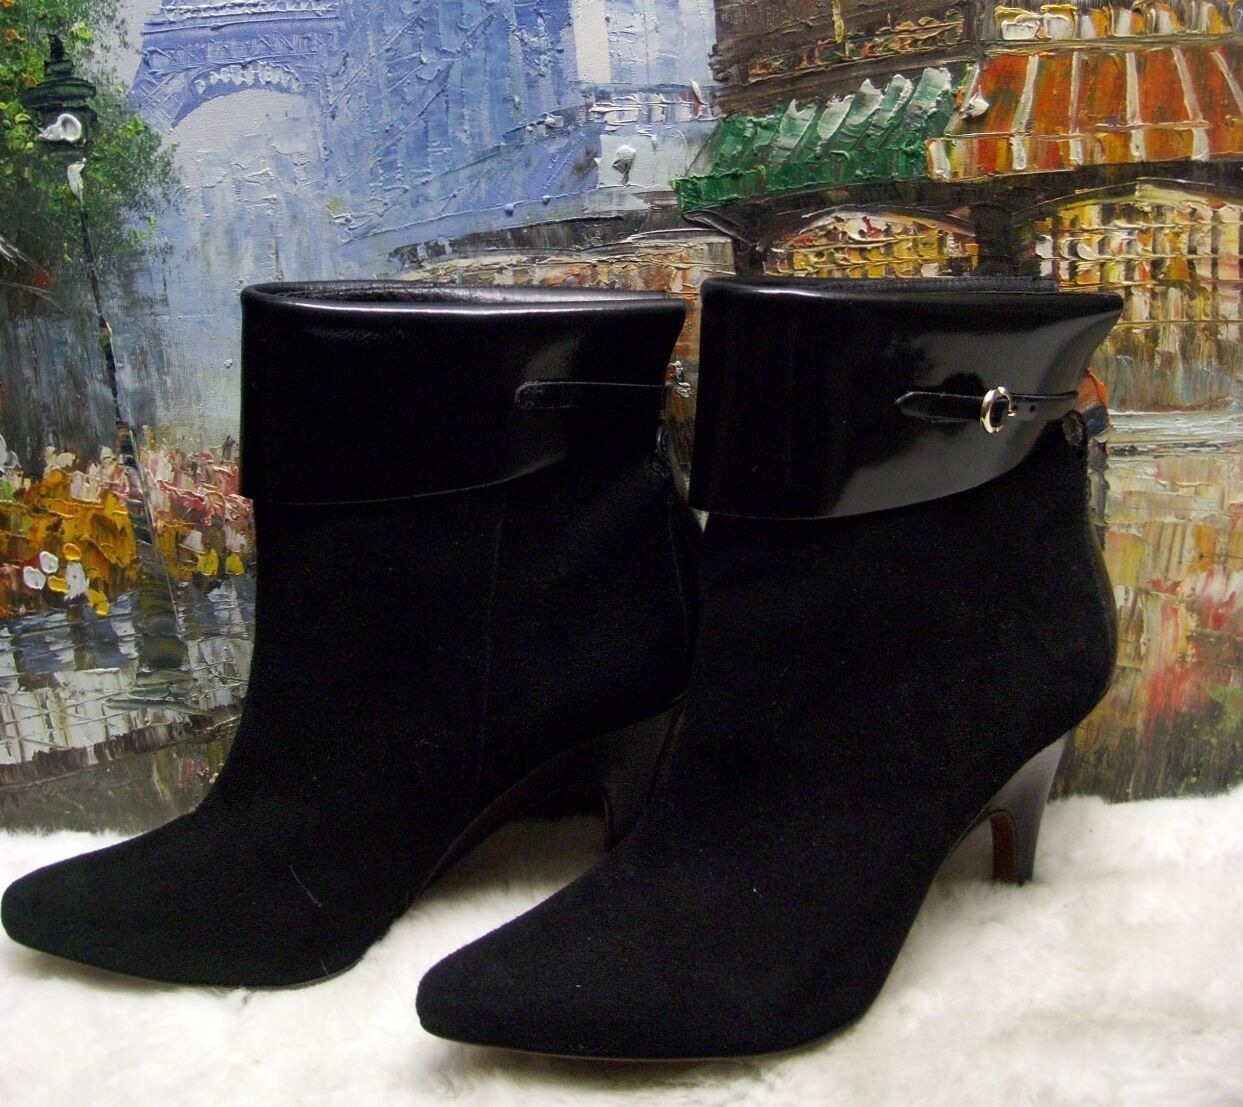 10 Crosby Derek Lam Black Ankle Boots - Size 8M -  395